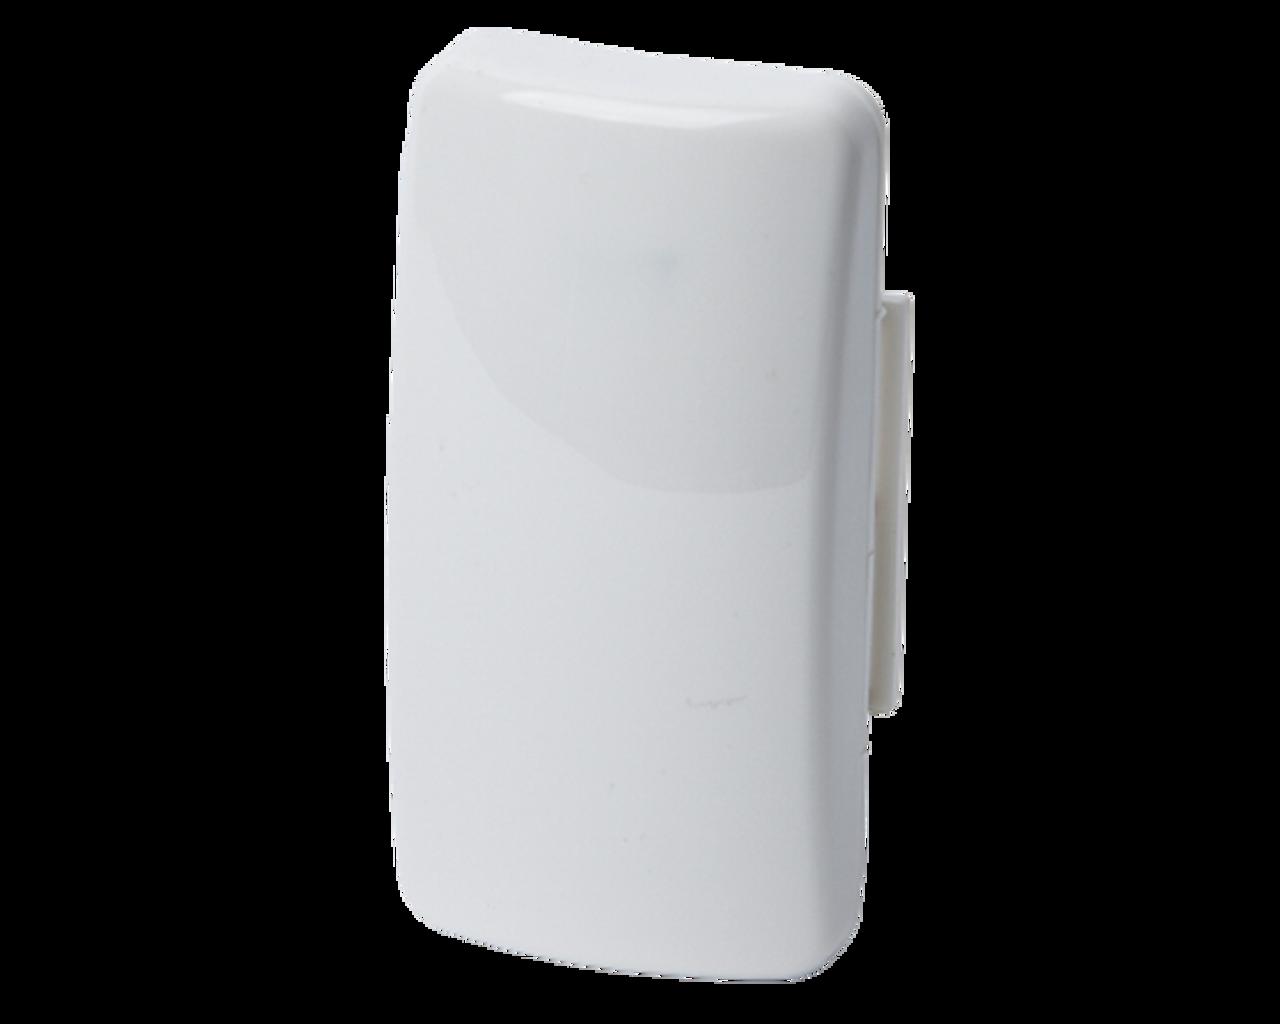 Honeywell 5821 Wireless Temperature Sensor & Flood Detector